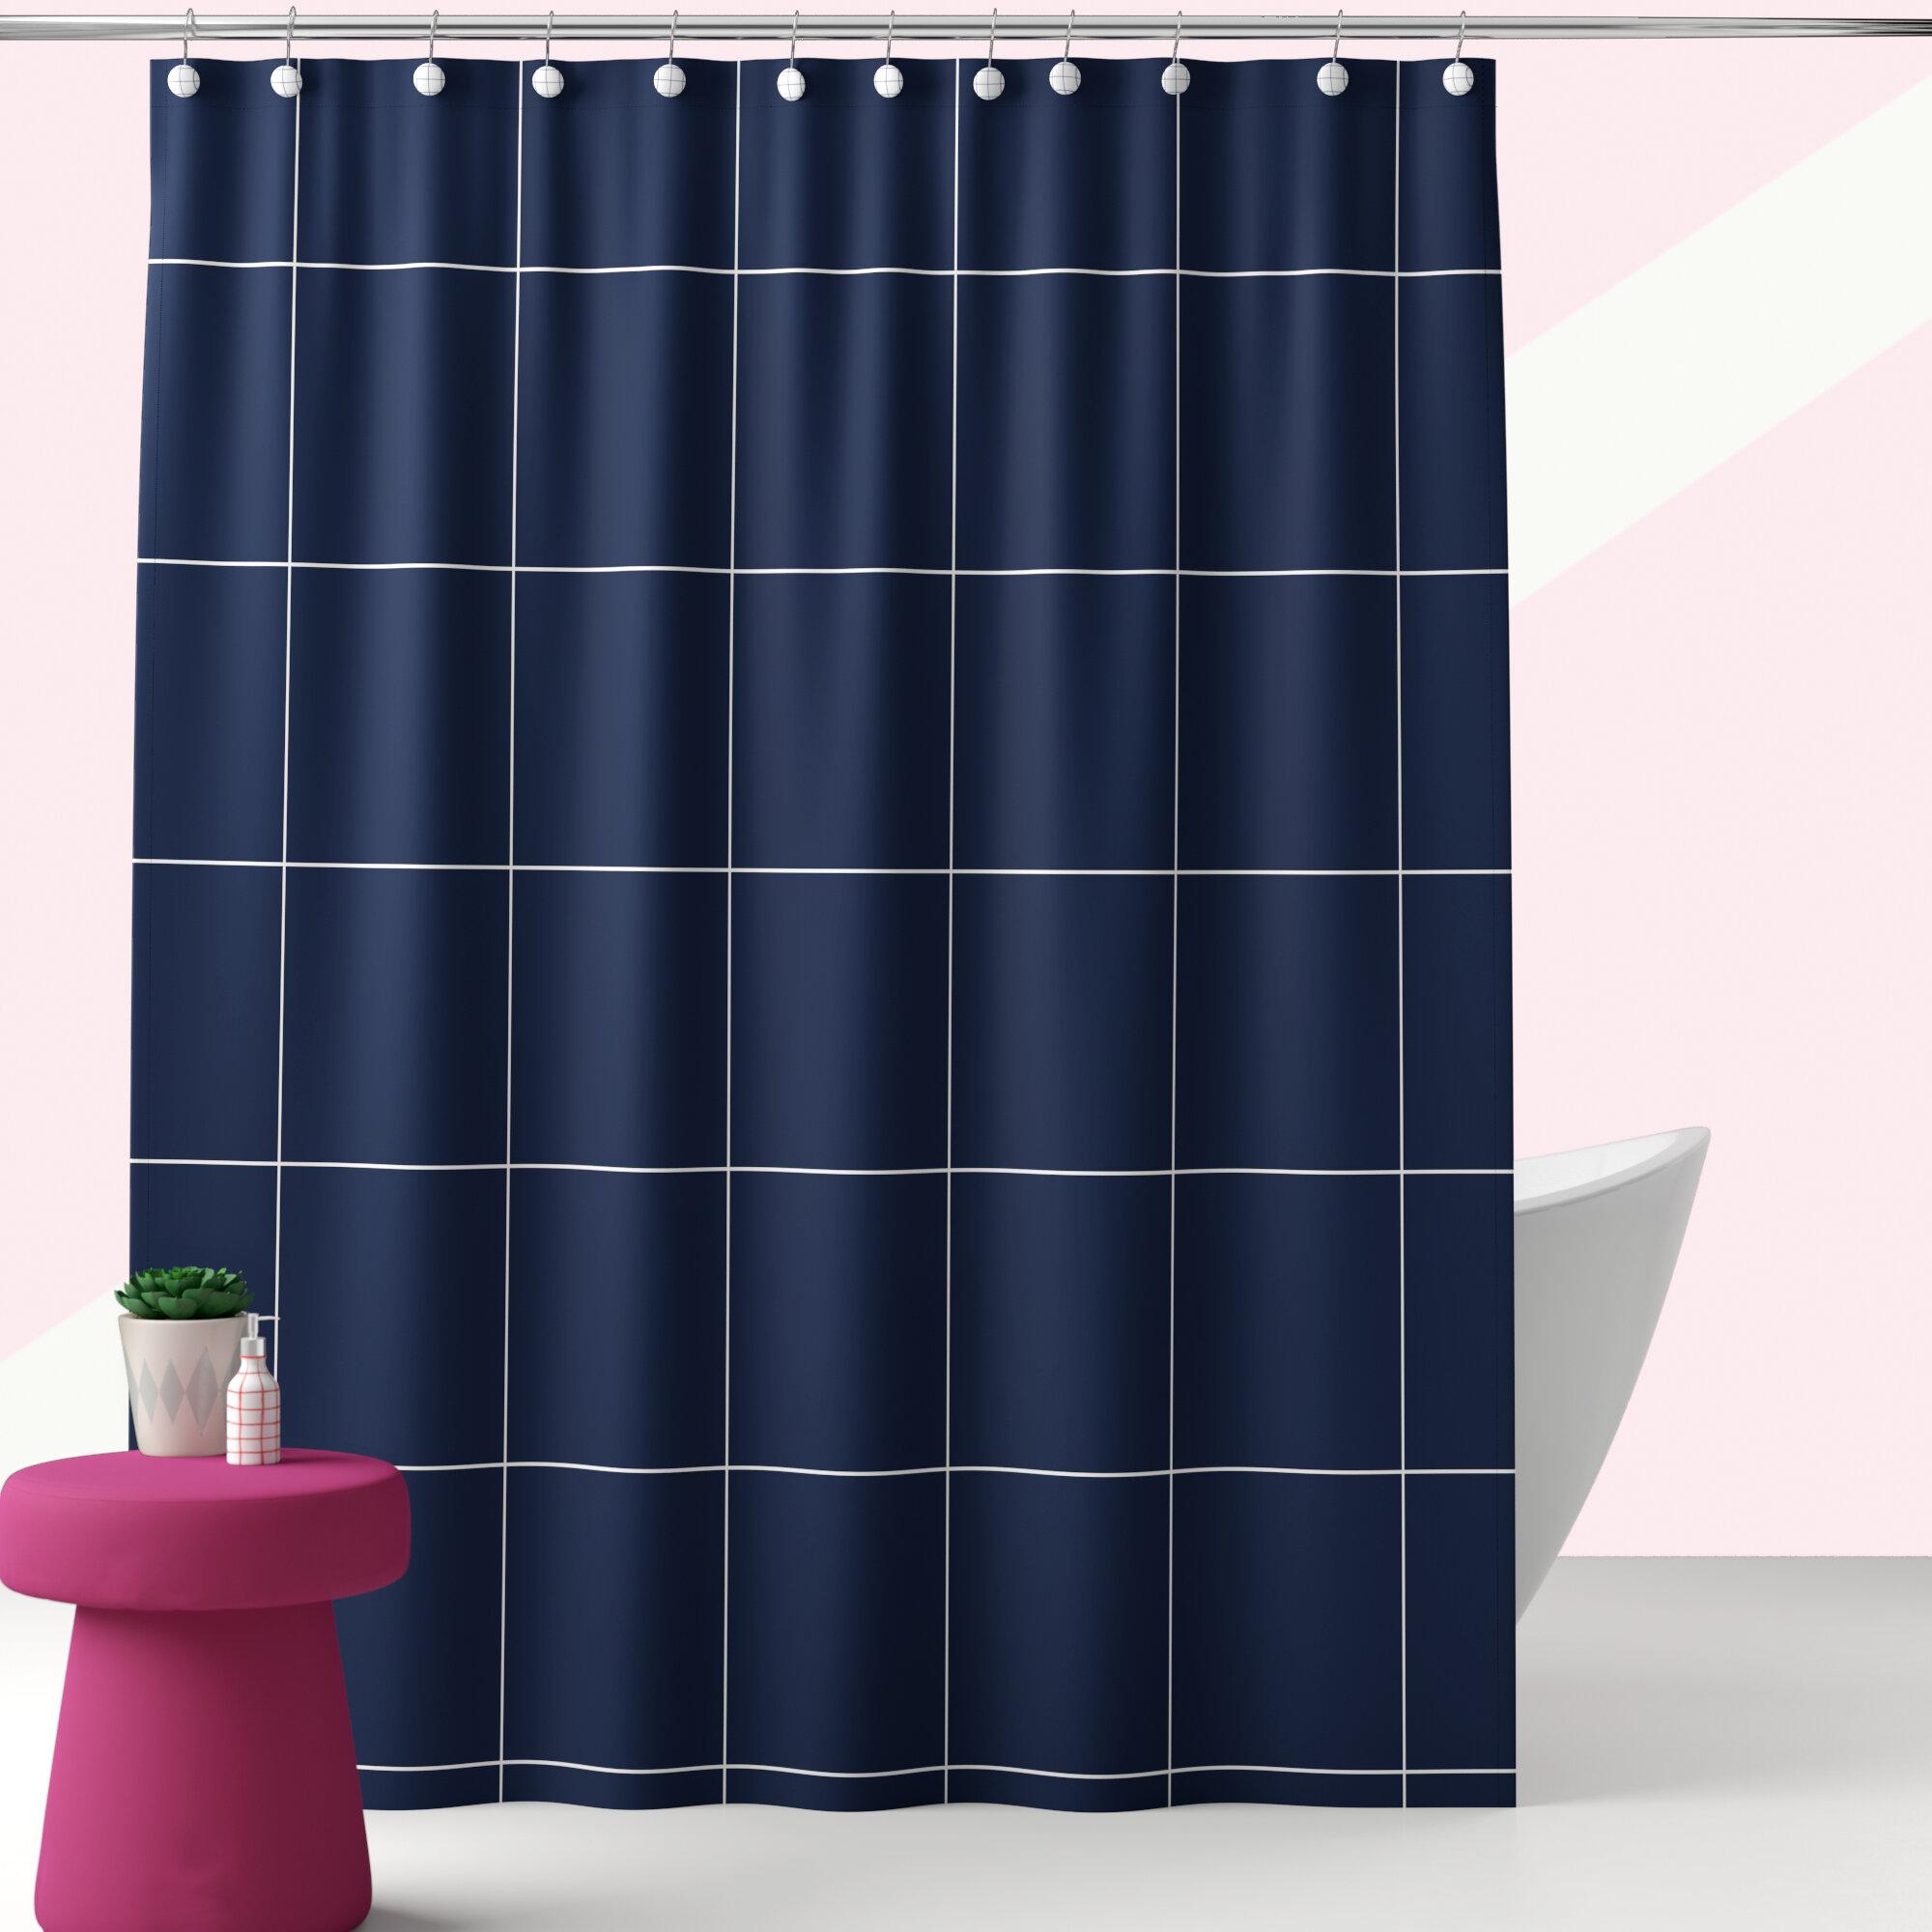 Bathroom Plain Shower Curtain 12 Matching Rings Hook Bath